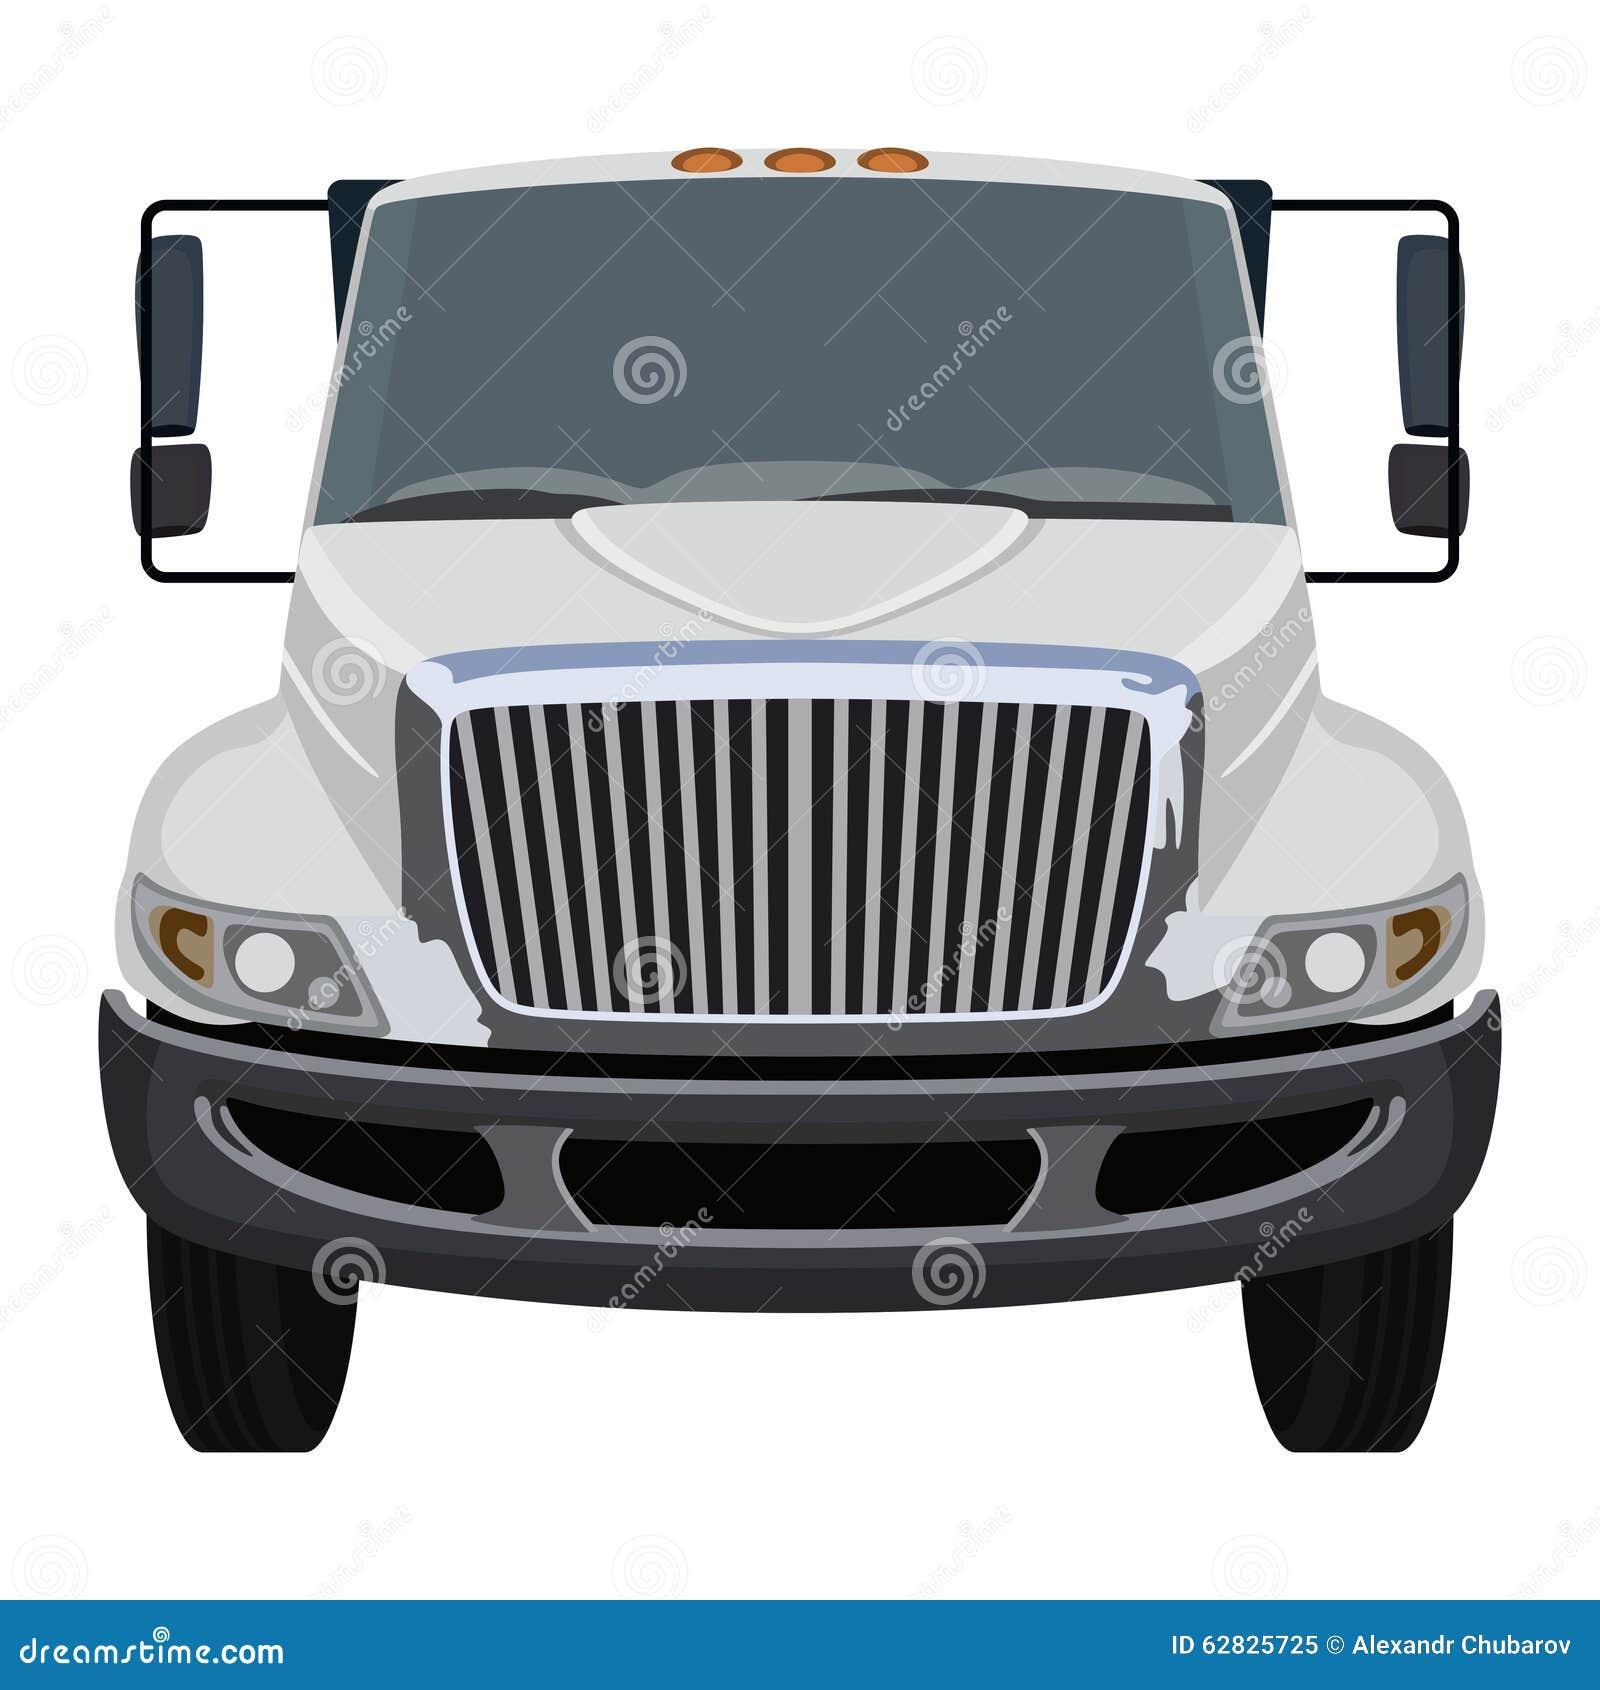 Semi Truck Seats >> Front Truck Stock Vector - Image: 62825725